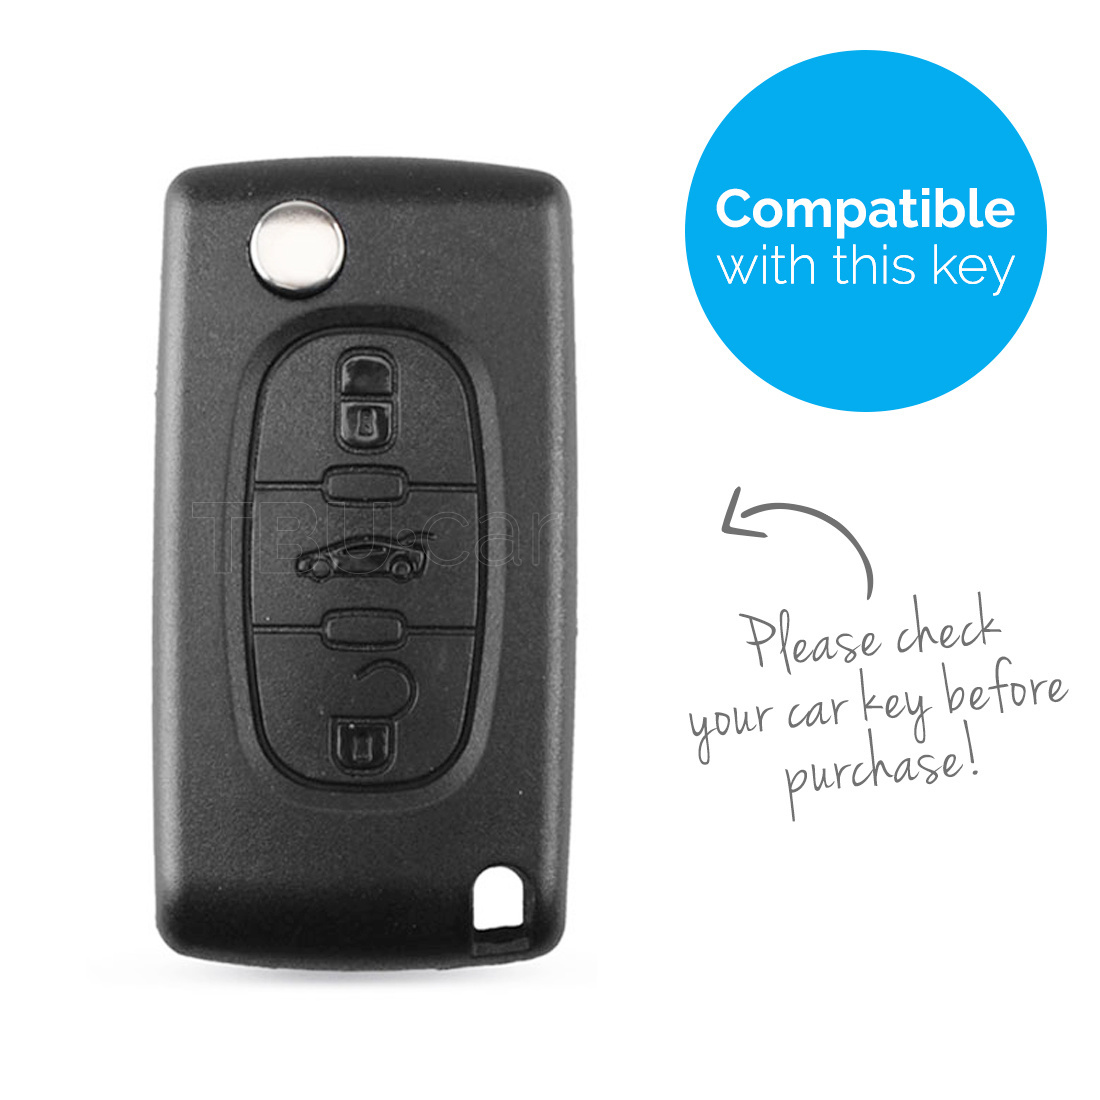 TBU car TBU car Sleutel cover compatibel met Lancia - Silicone sleutelhoesje - beschermhoesje autosleutel - Zwart